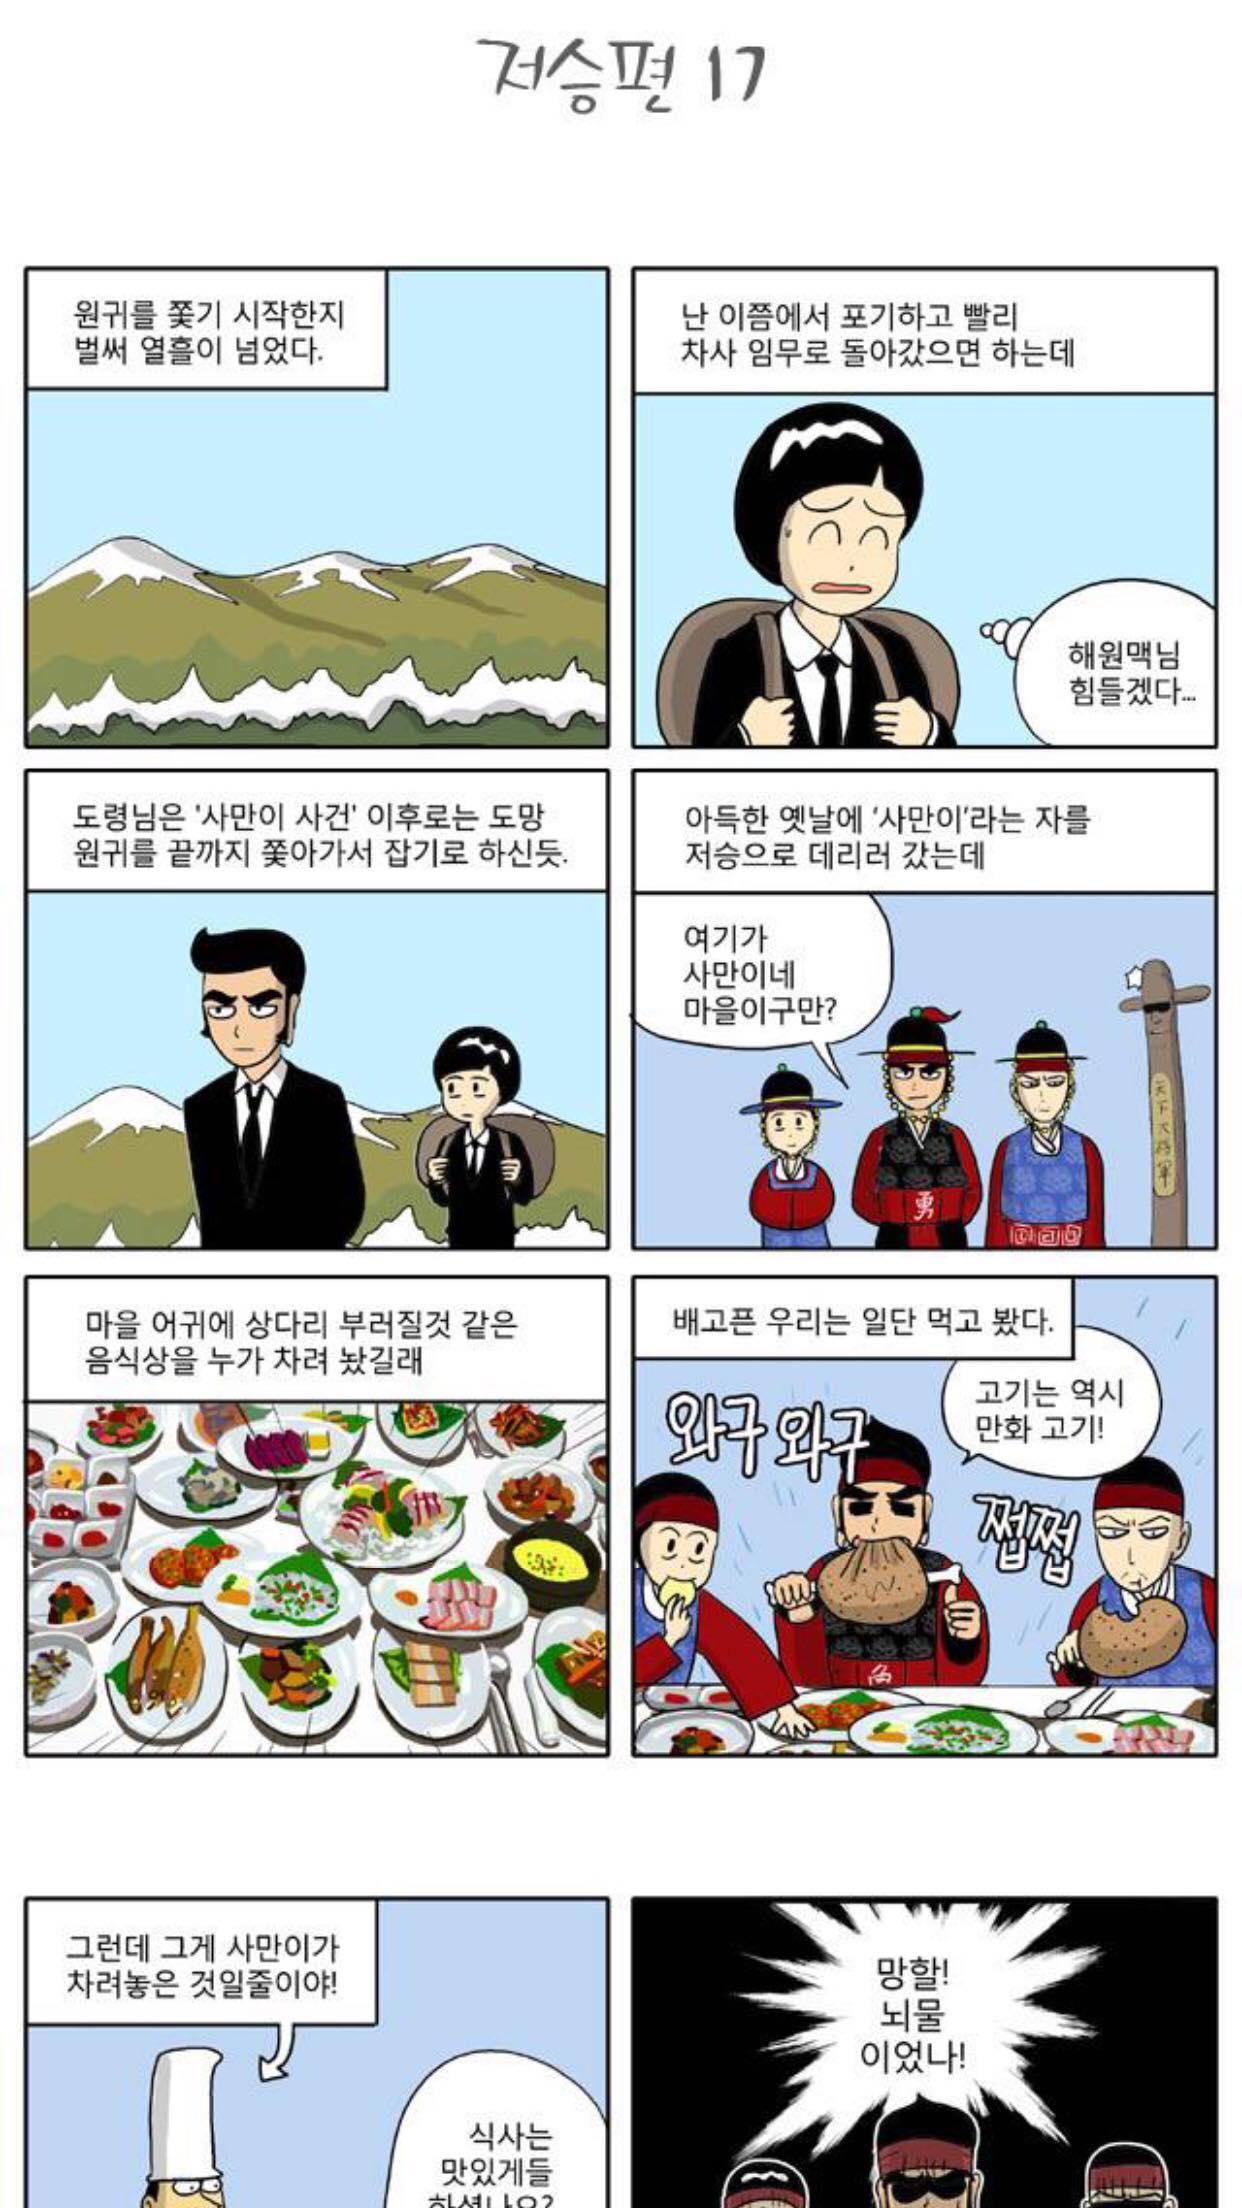 korea-comic-kr-ver-along-with-gods